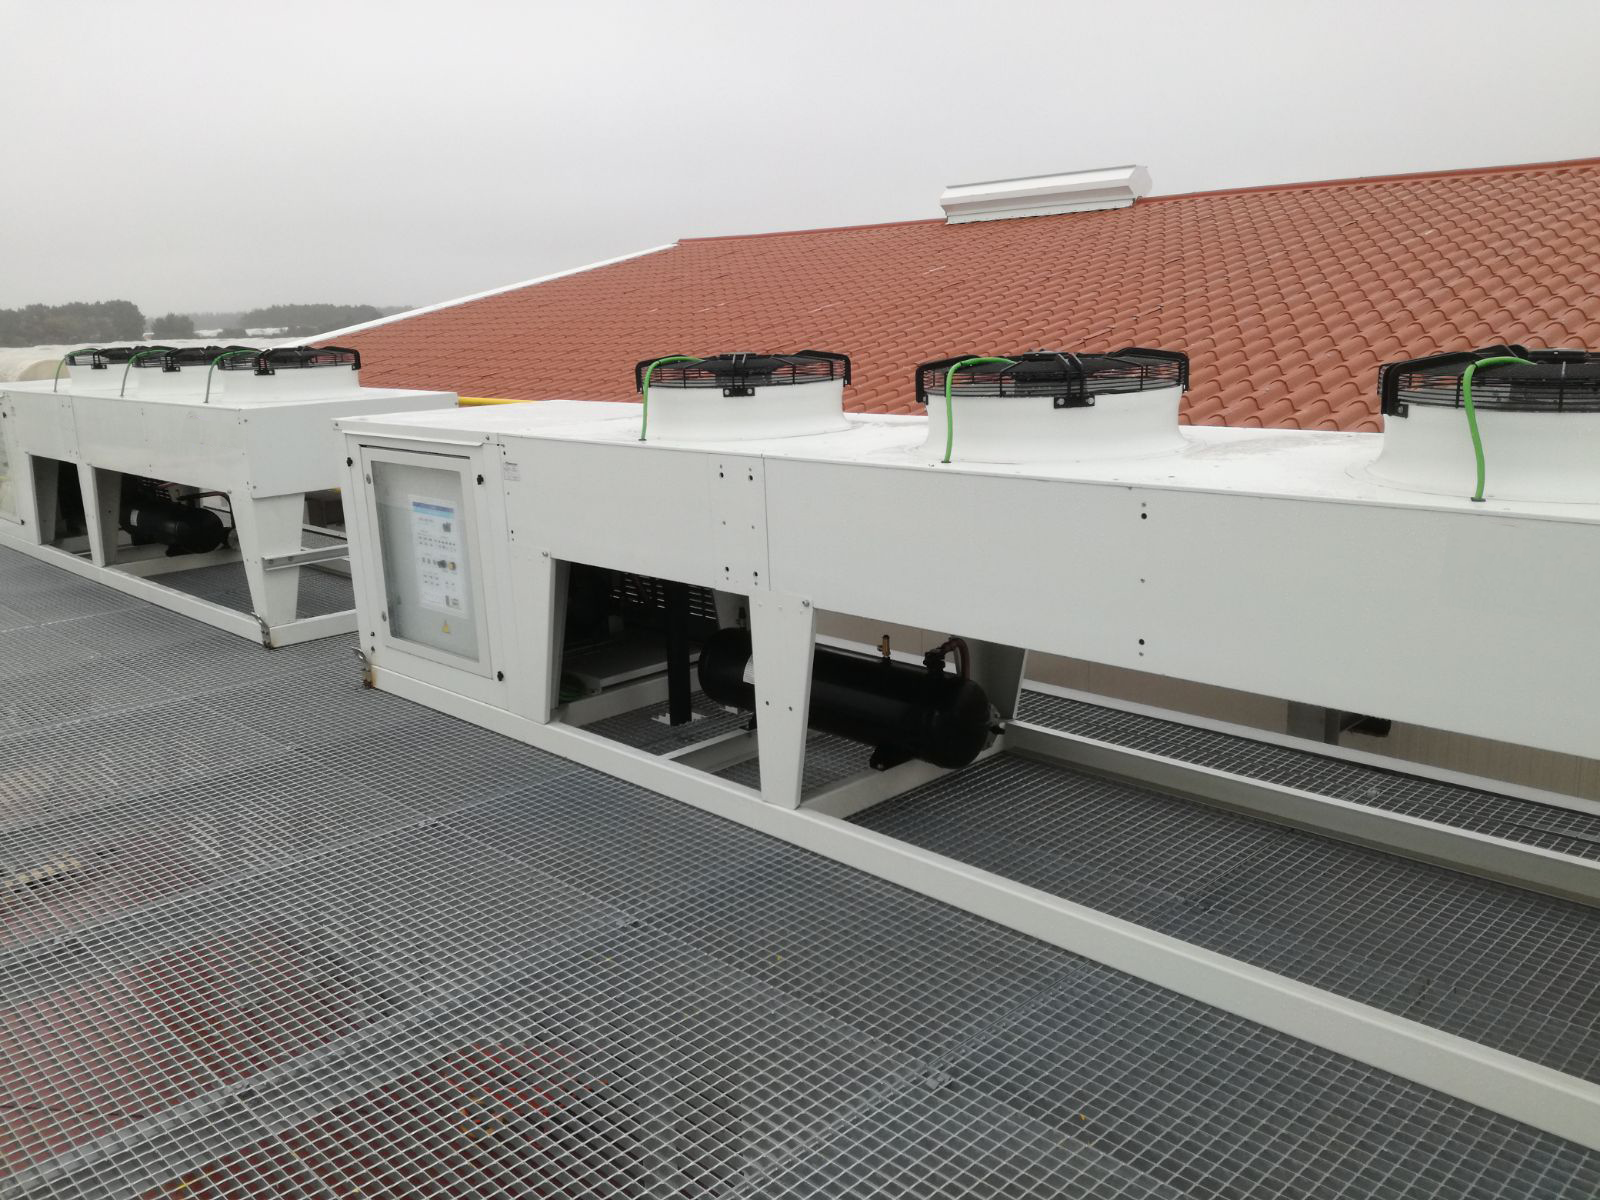 Unidades condensadoras carrozadas sobre soporte metálico para cámara de conservación de plantas de frambuesas.